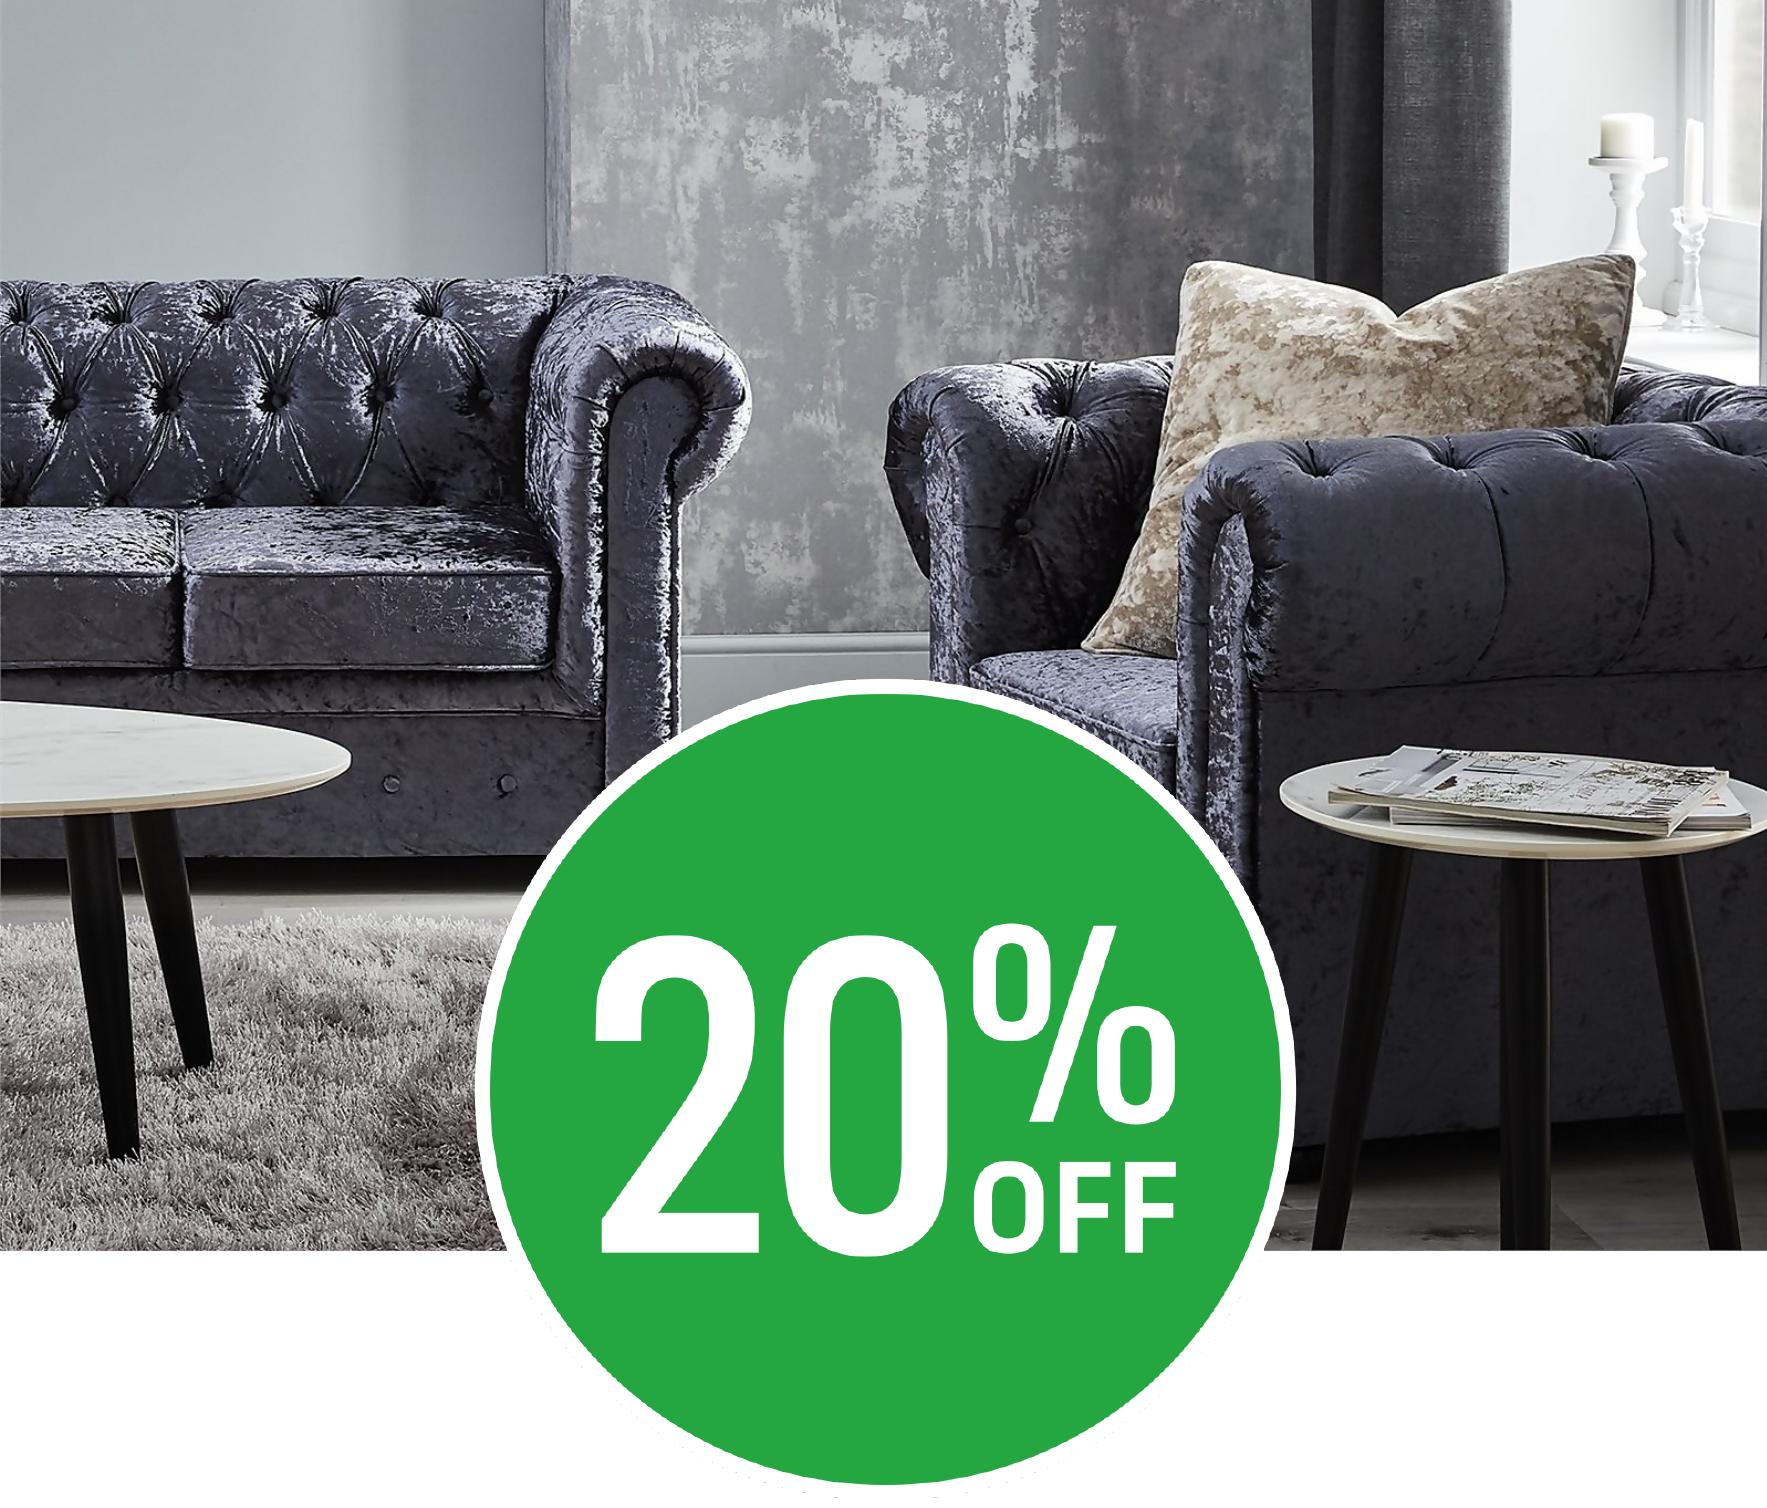 Get 20% off Hayley, Chesterfield Velvet & Skelby Furniture ranges